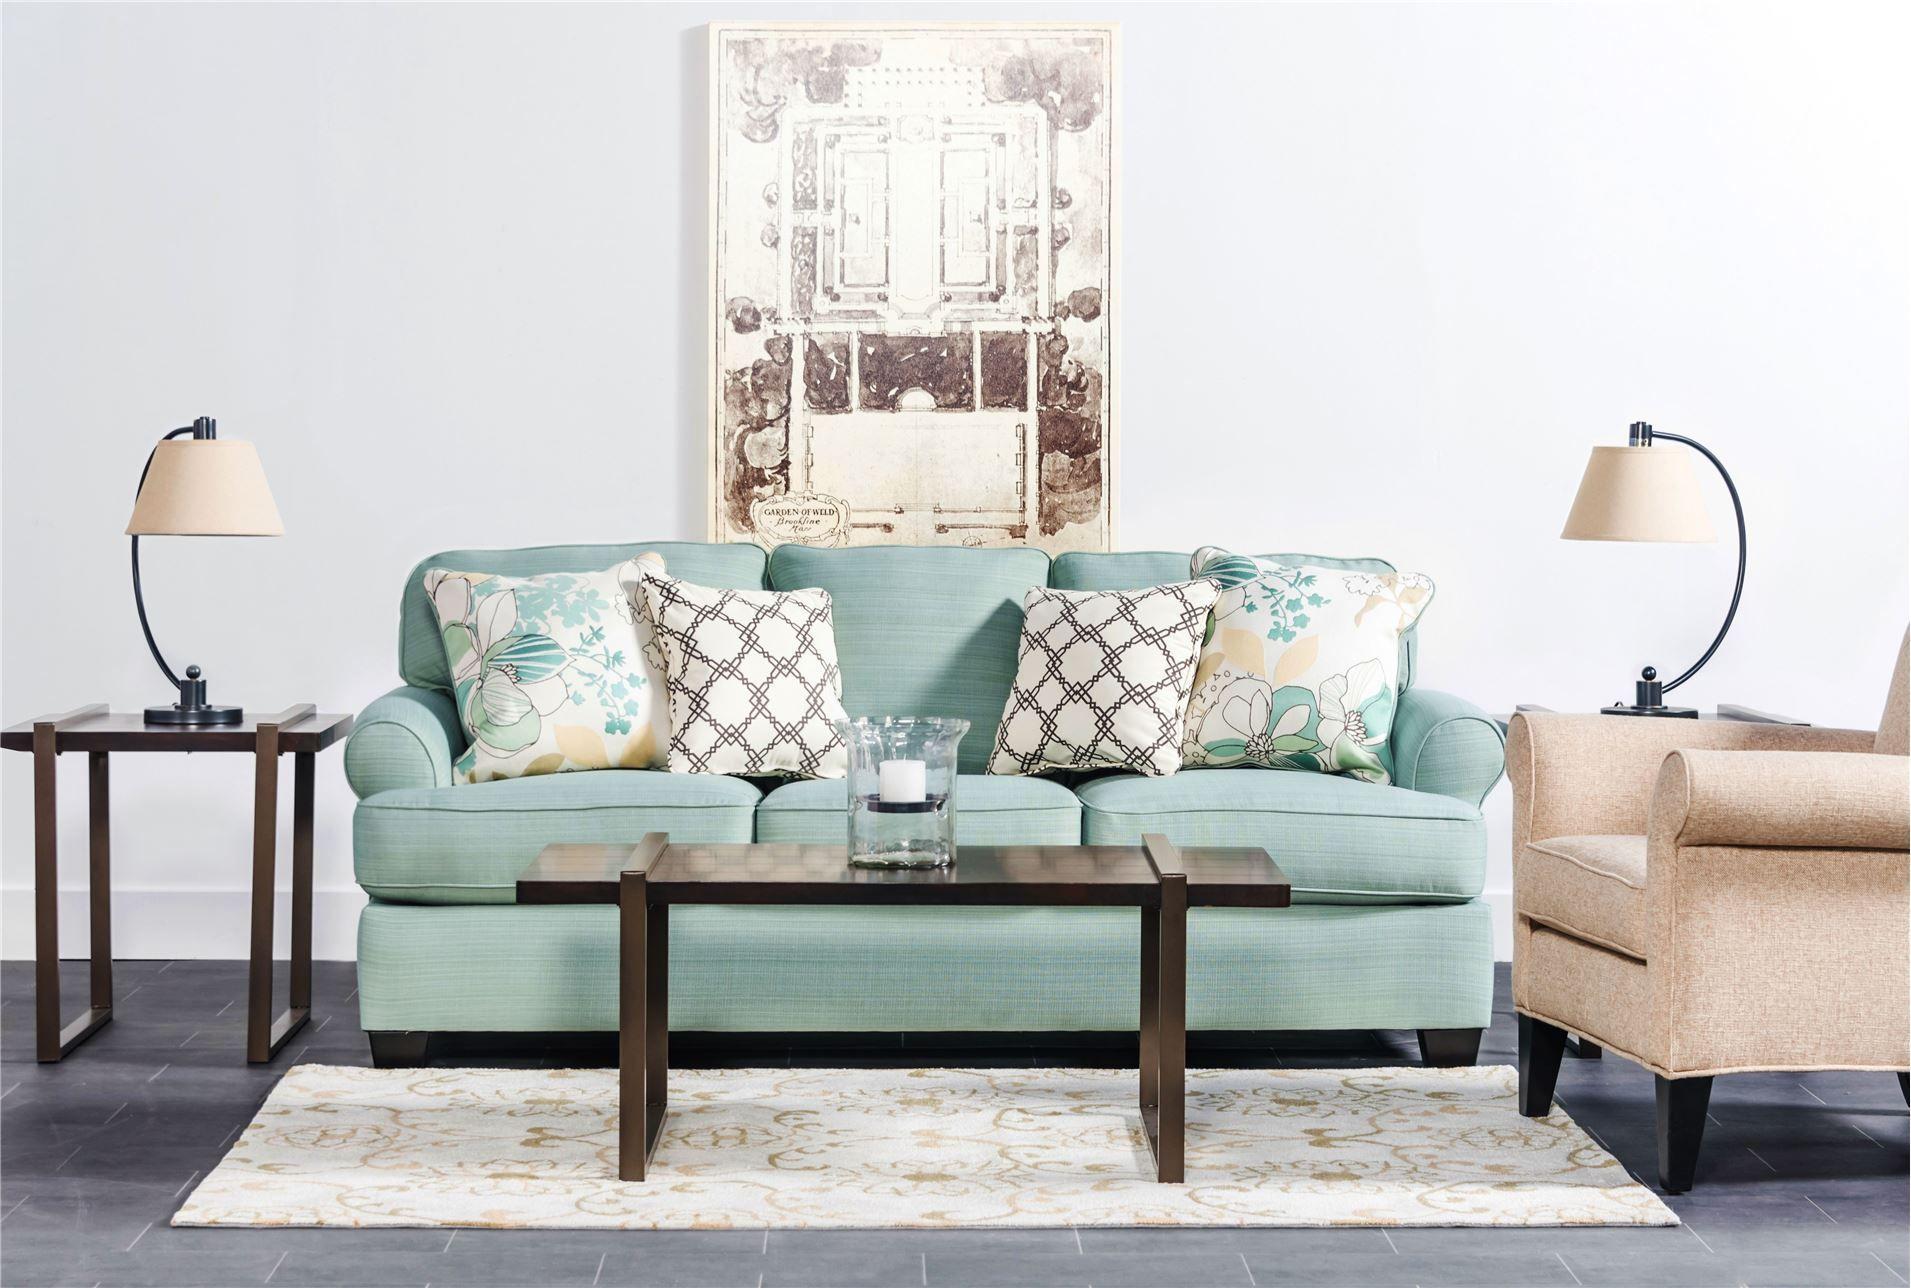 Daystar Seafoam Sofa - Signature | Living Room | Pinterest | Living ...